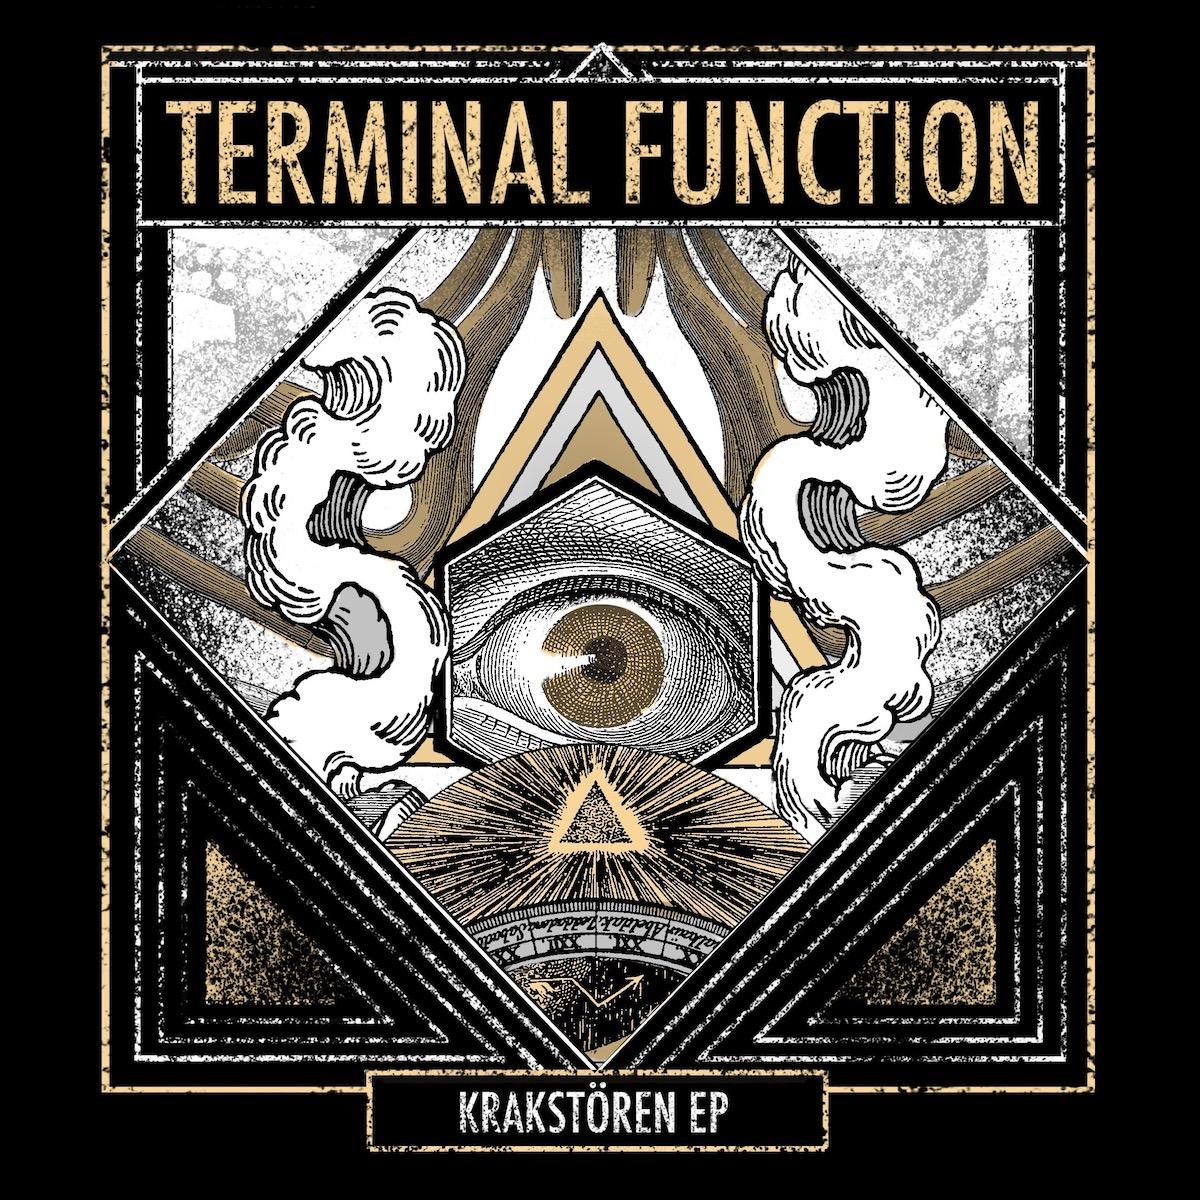 Terminal Function - Krakstoren EP cover 3jpg